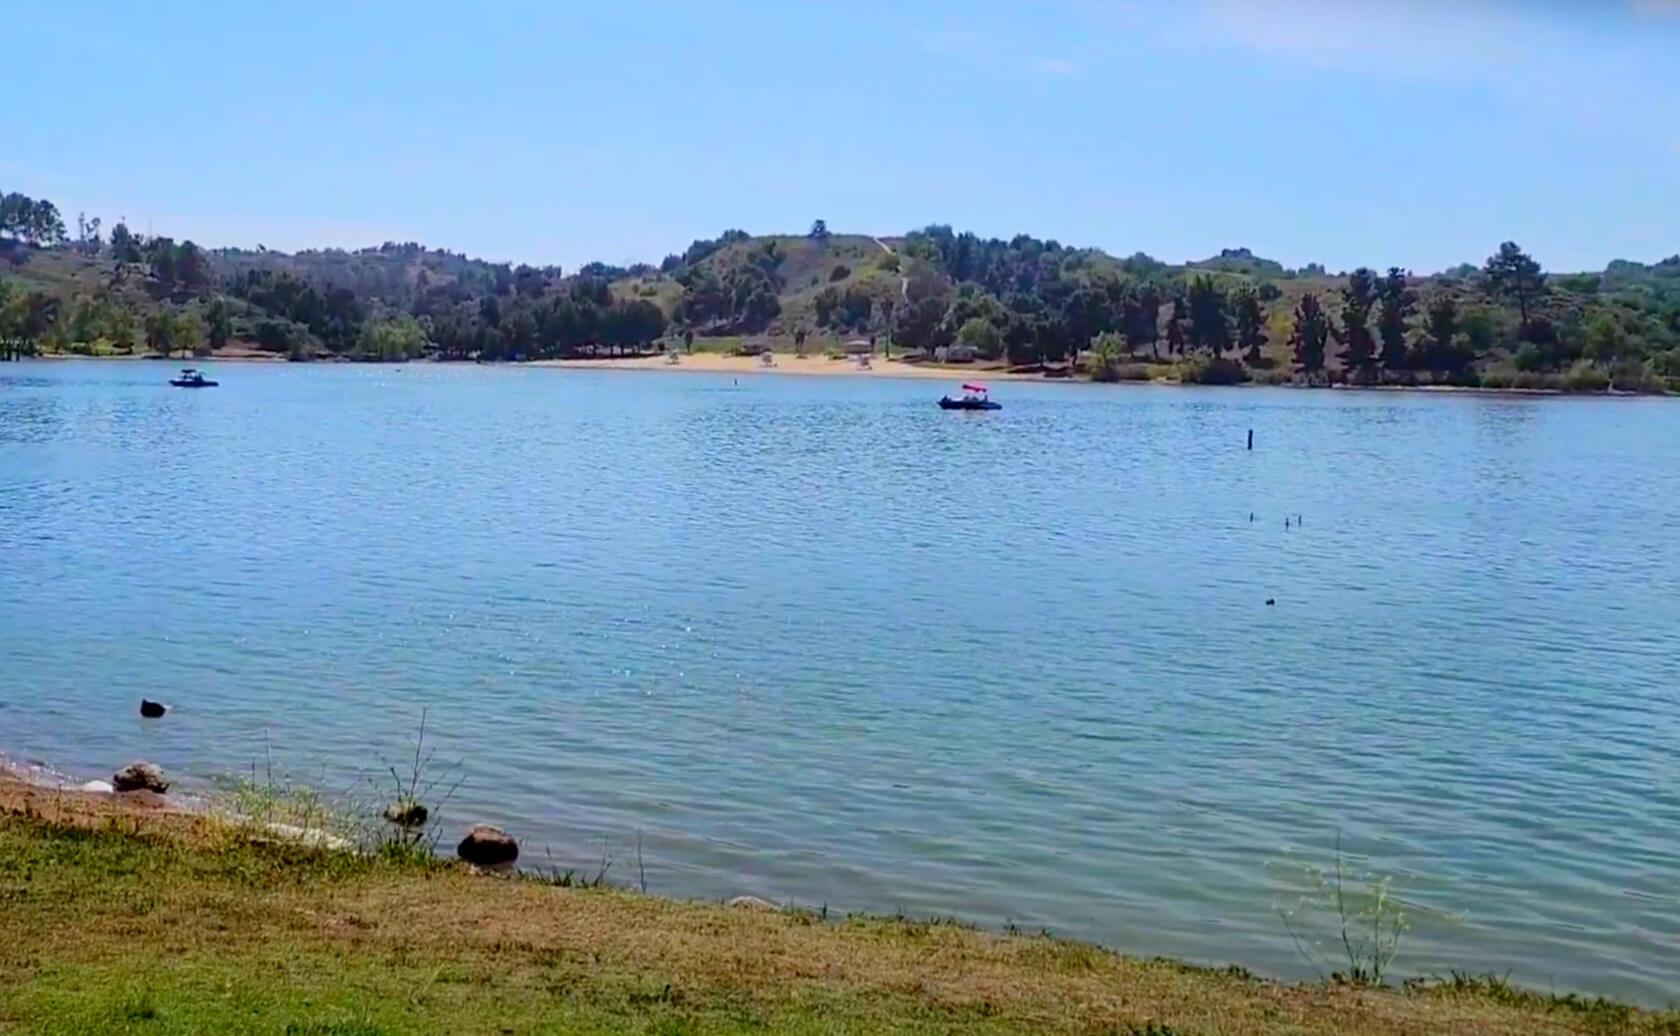 Puddingstone-Lake-Fishing-Guide-Report-California-03